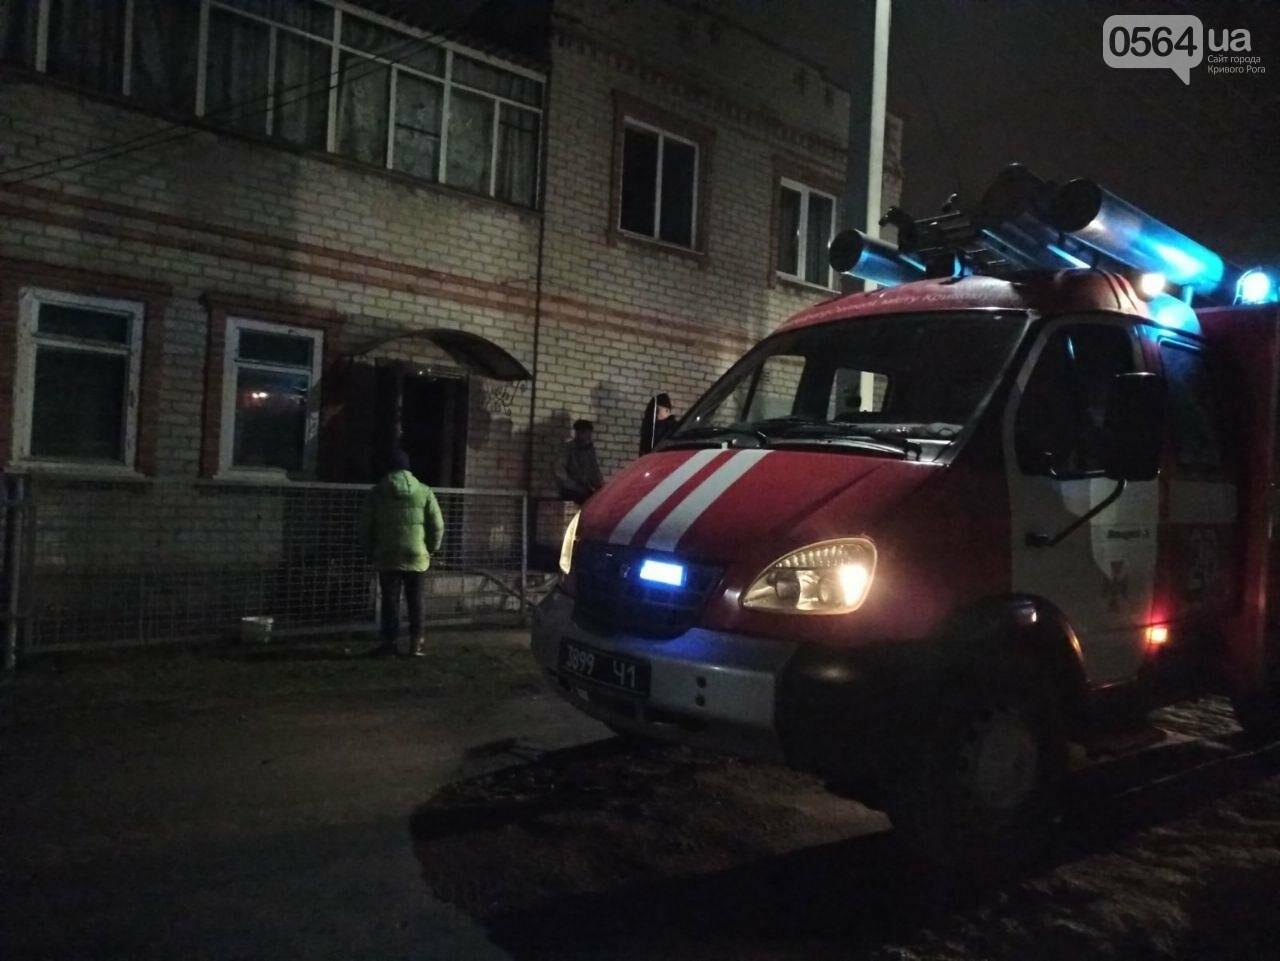 Во время пожара в Кривом Роге пострадал 70-летний пенсионер, - ФОТО , фото-1